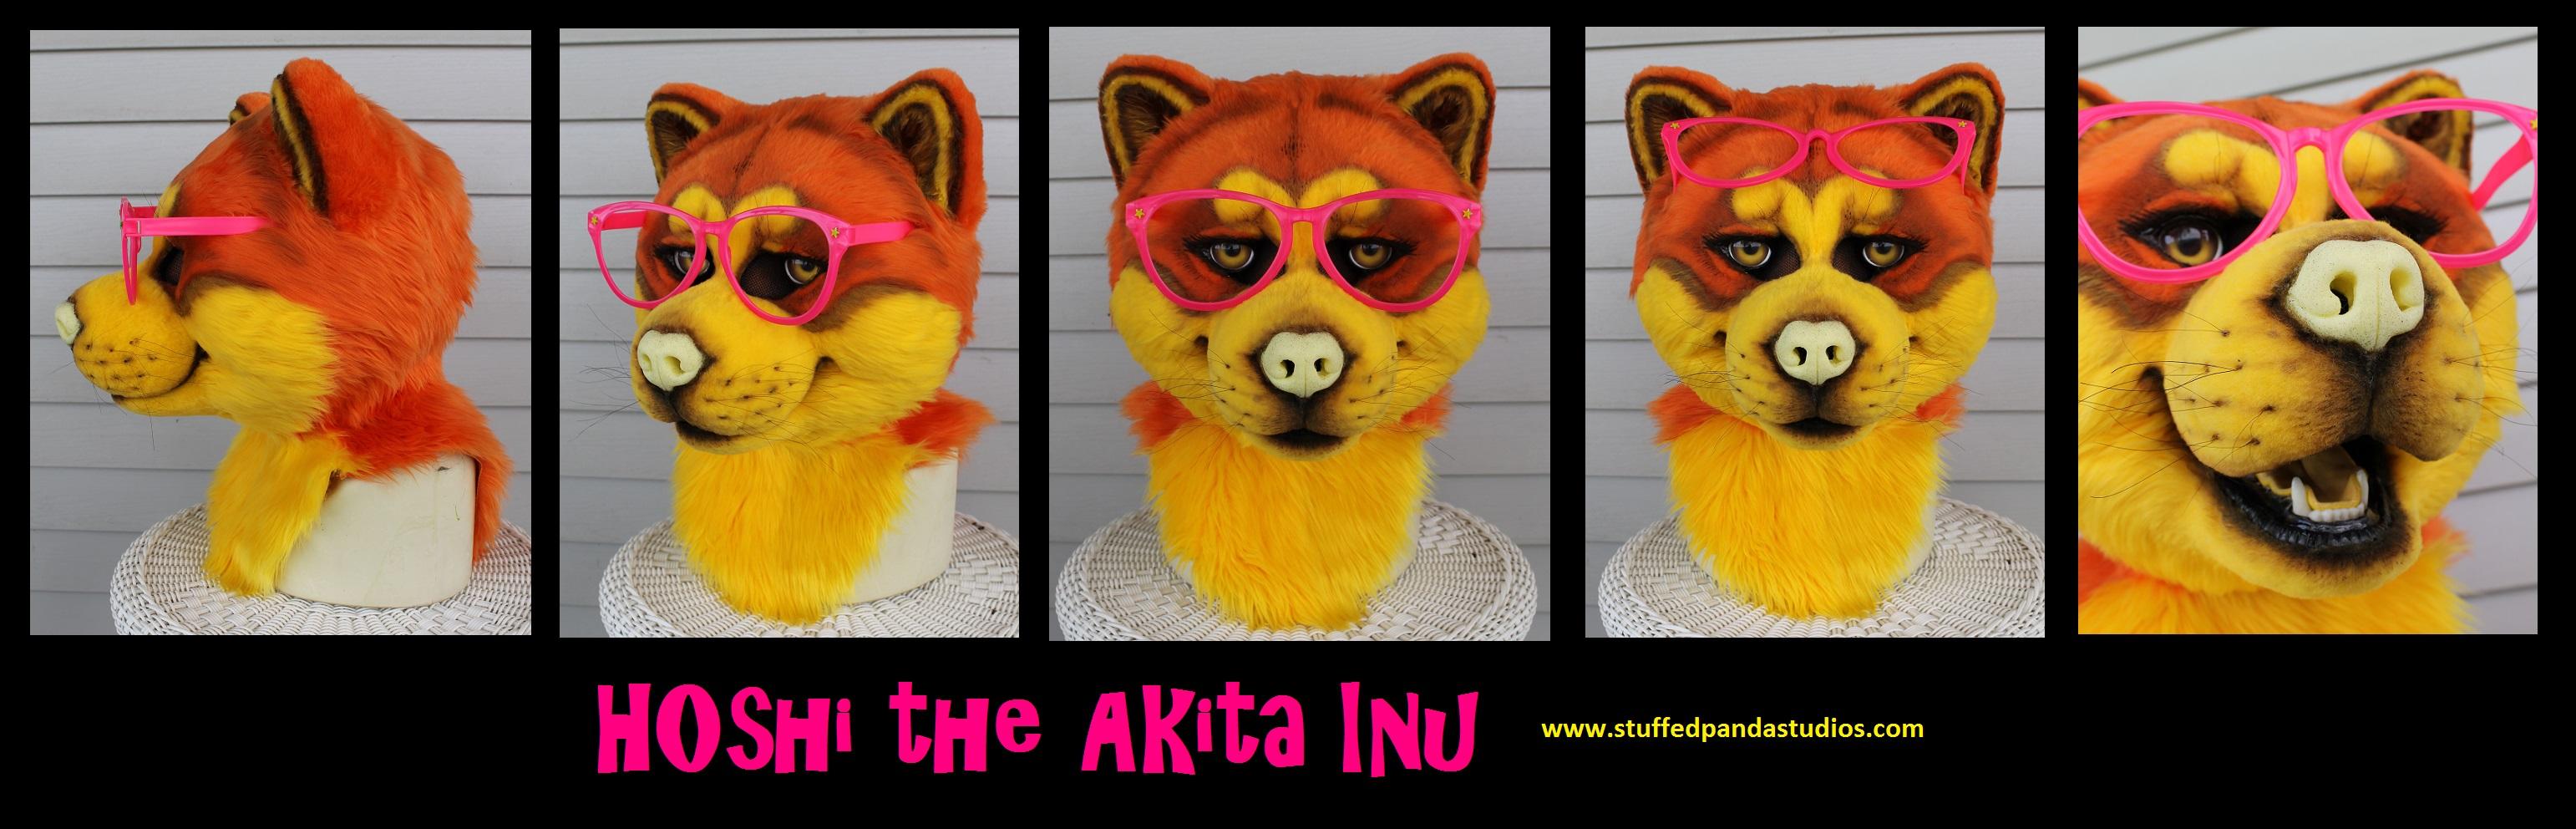 Hoshi the Akita Inu mask by stuffedpanda-cosplay